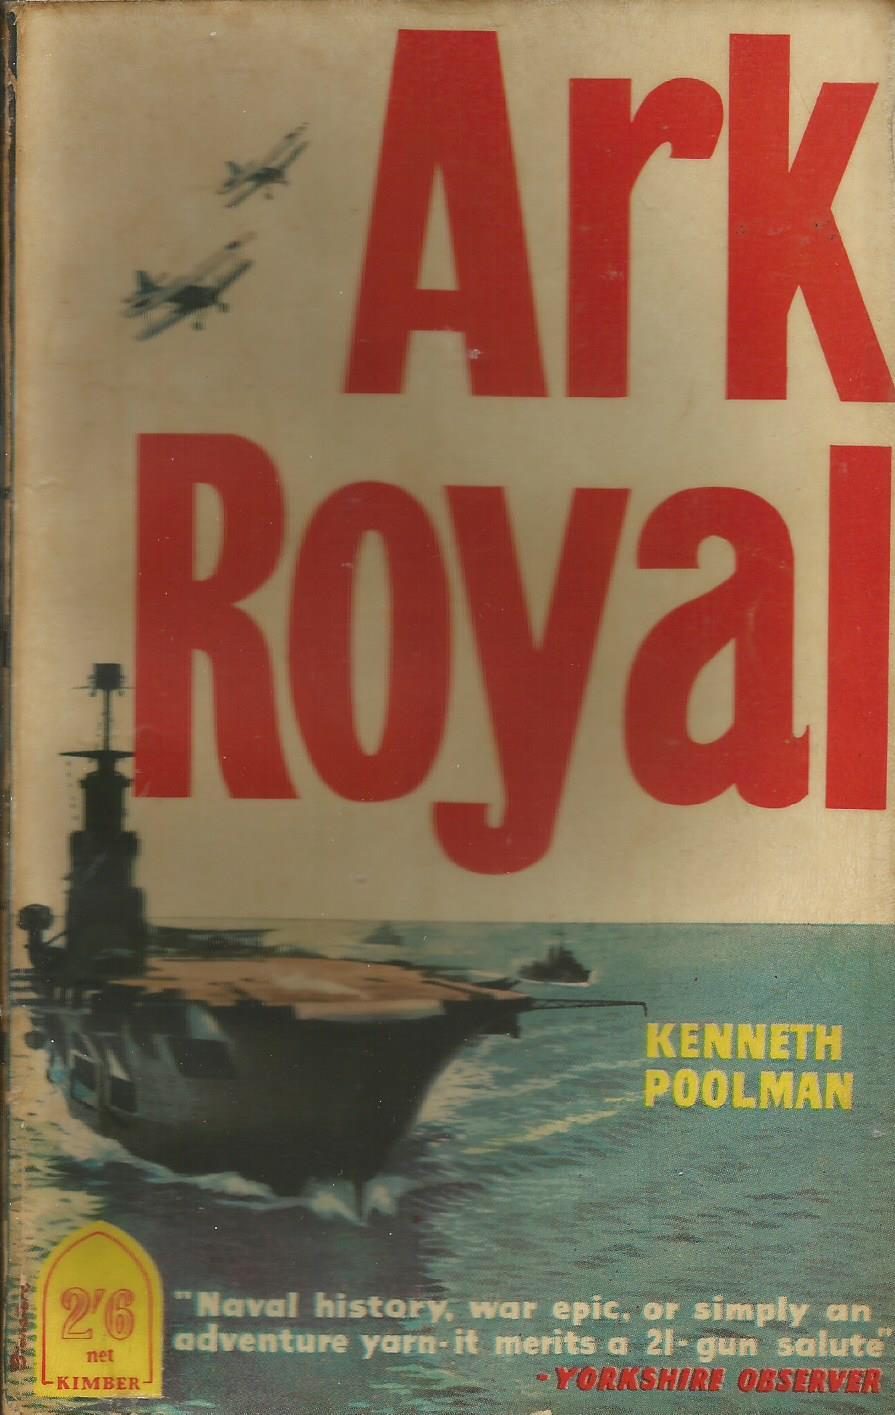 Grande histoire des porte-avions de combat - Page 3 Ark_ro13